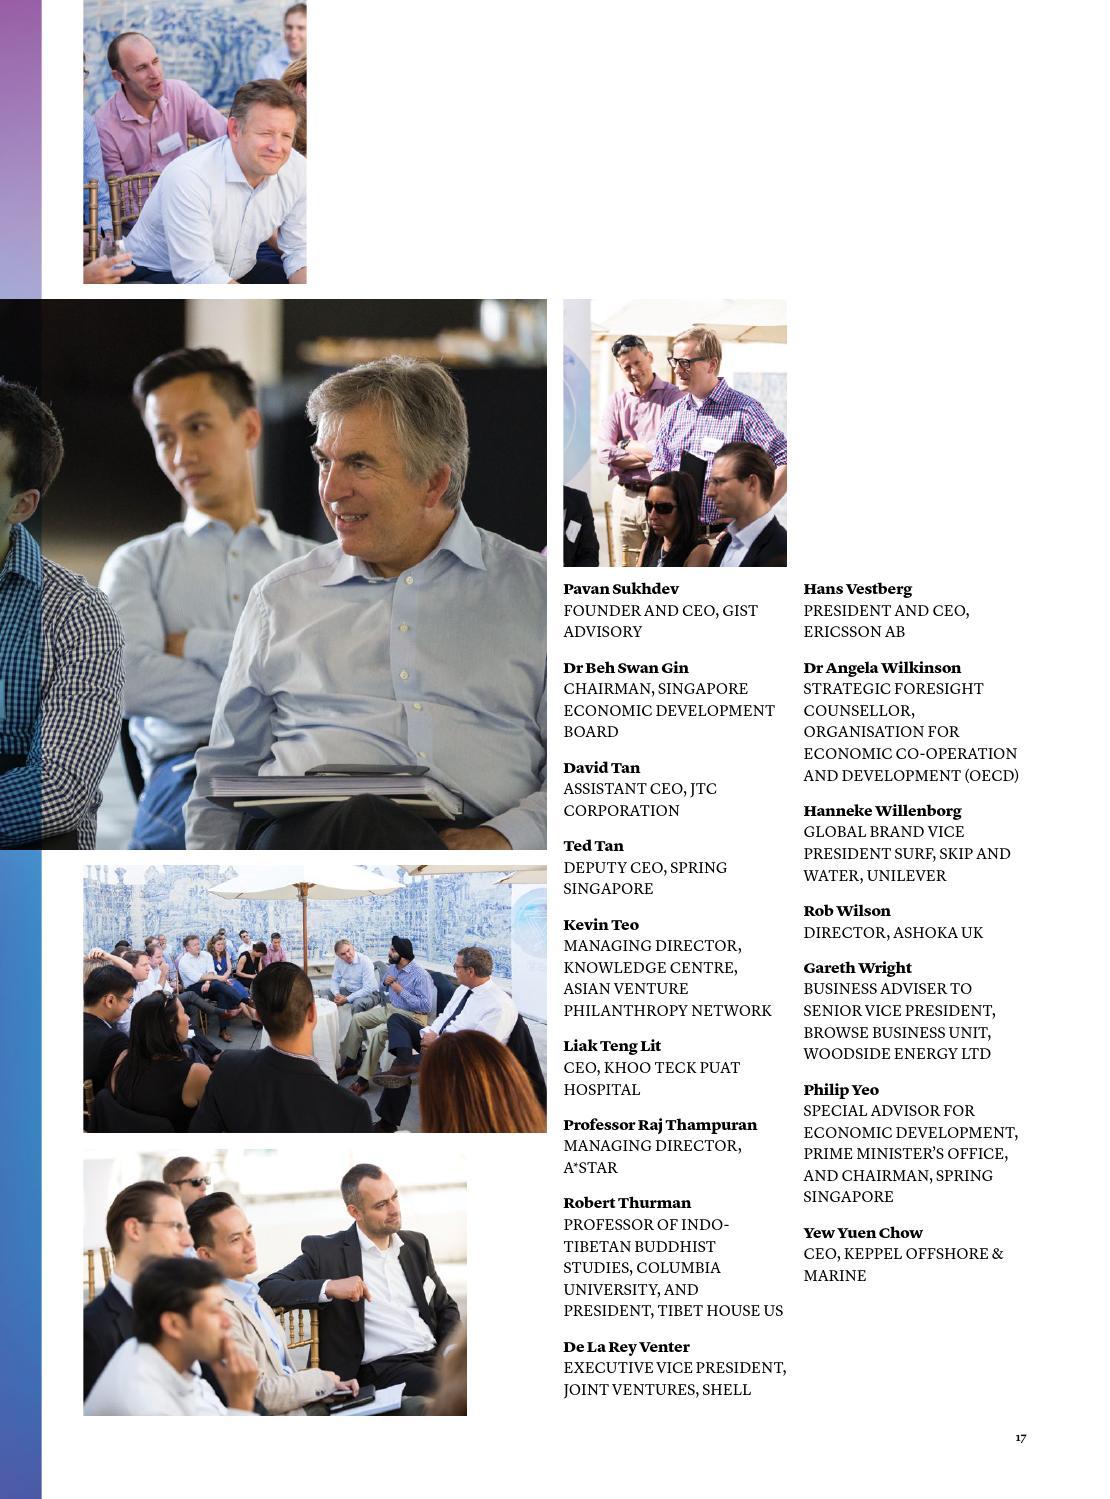 leadership vanguard yearbook by xynteo issuu